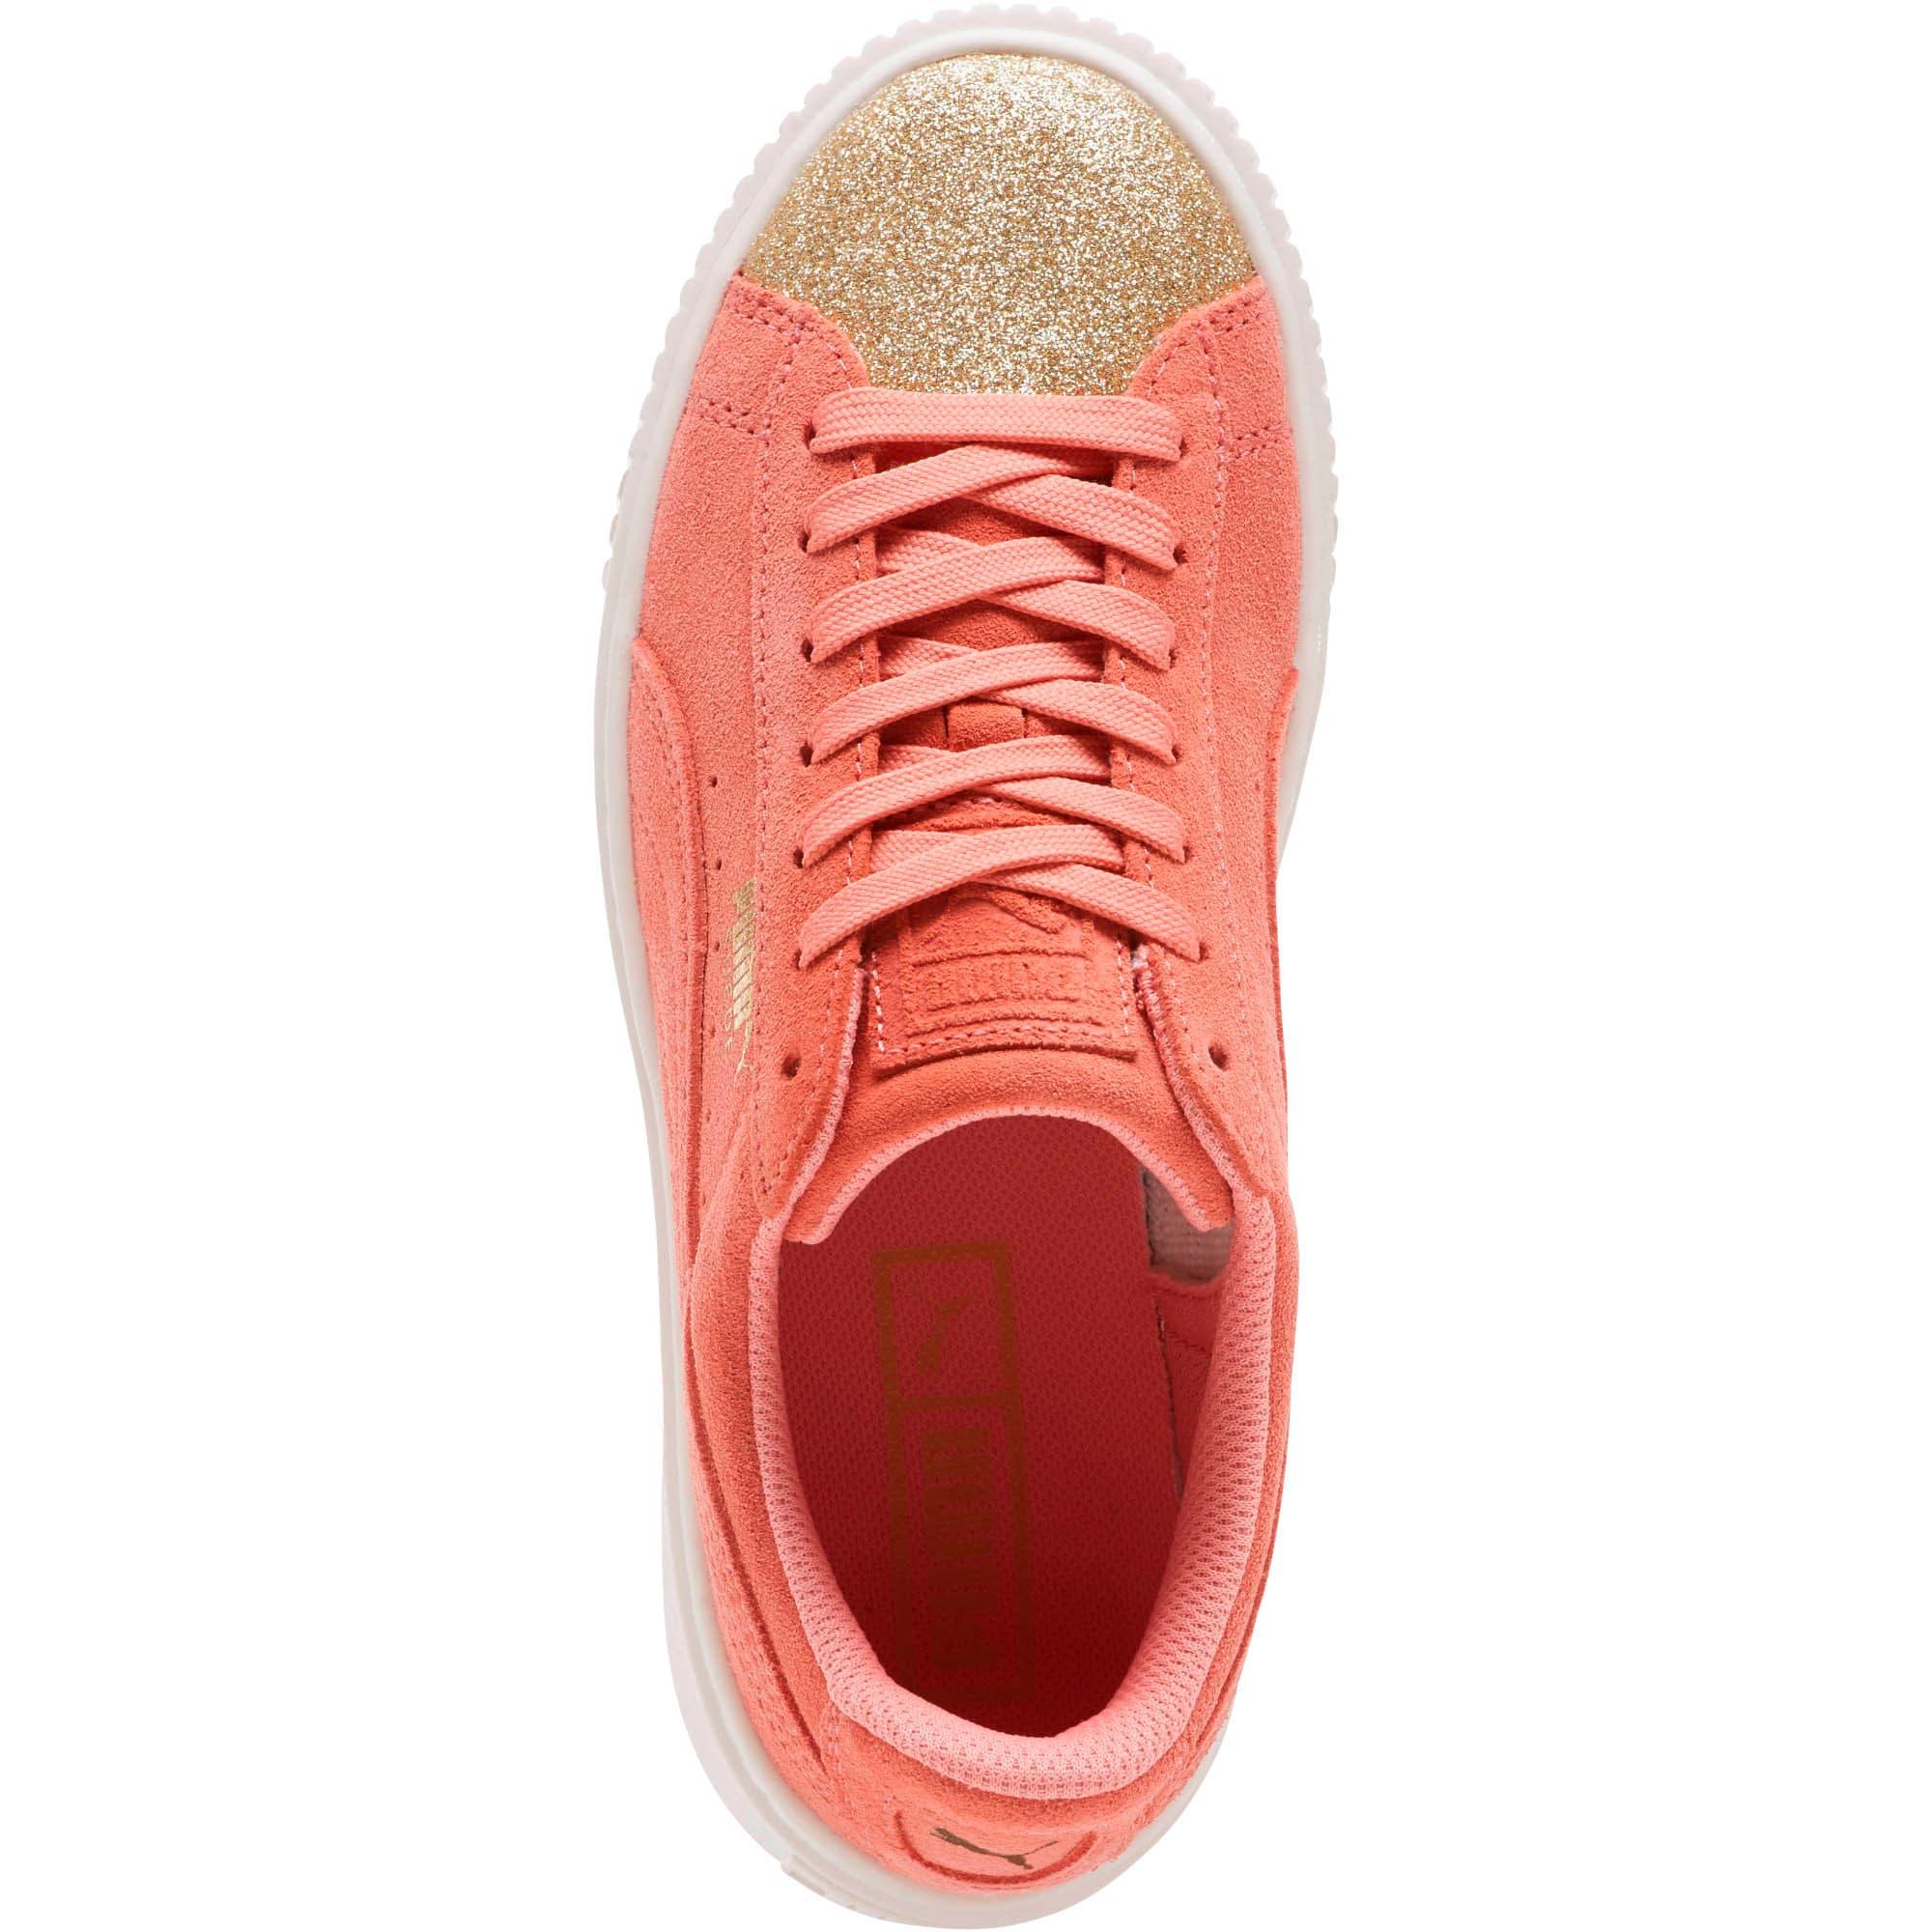 Thumbnail 5 of Suede Platform Glam Girls' Sneakers, Puma Team Gold-Shell Pink, medium